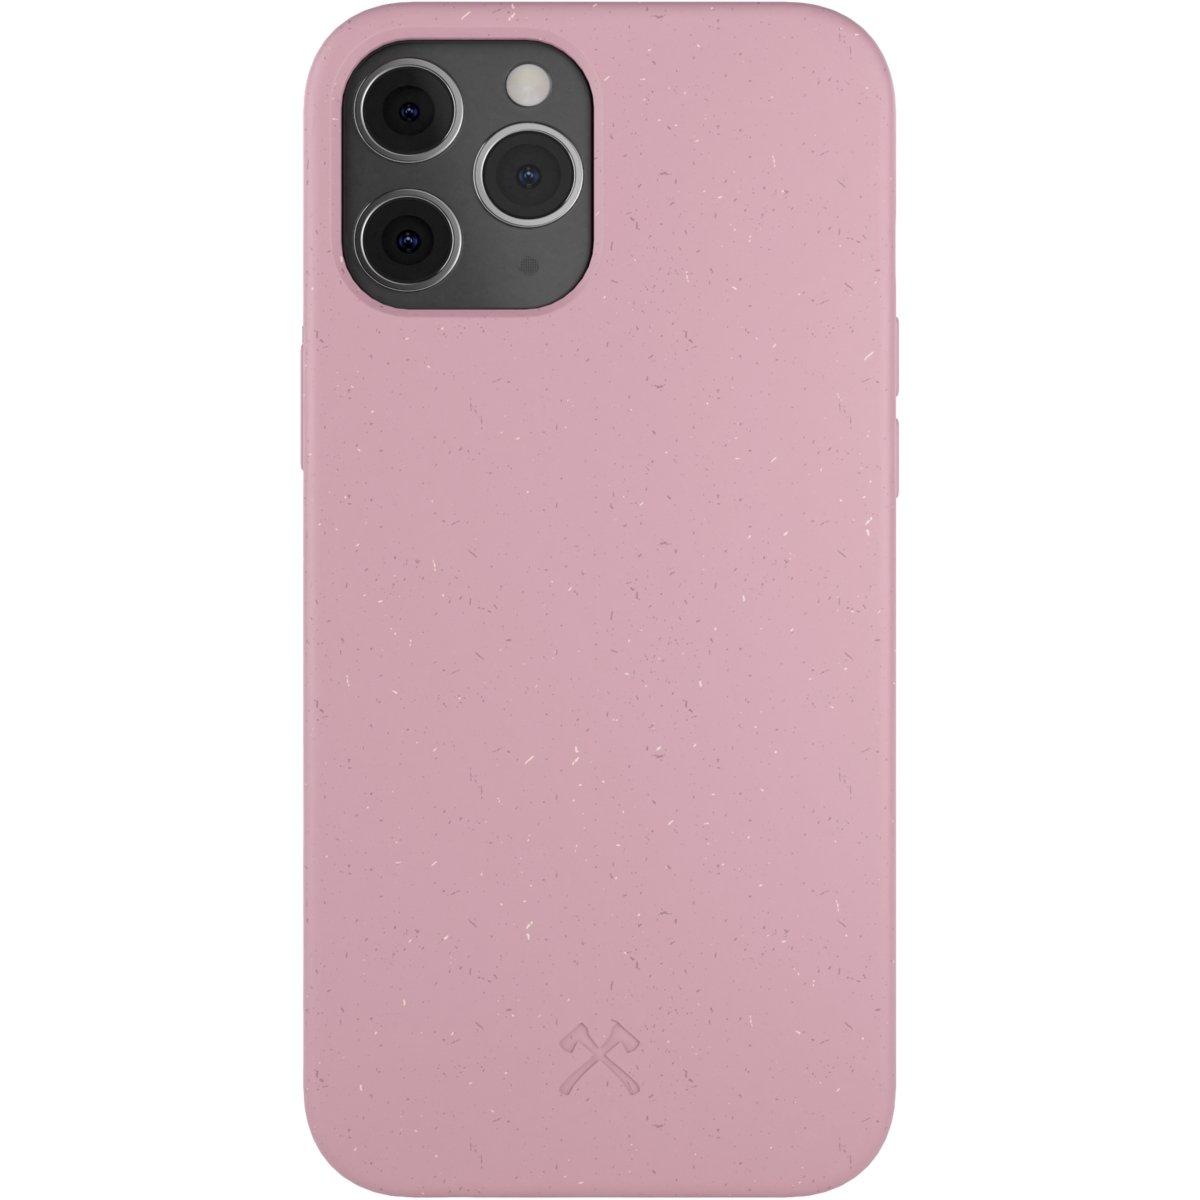 Woodcessories Bio Case AM iPhone 12 Pro Max - pink